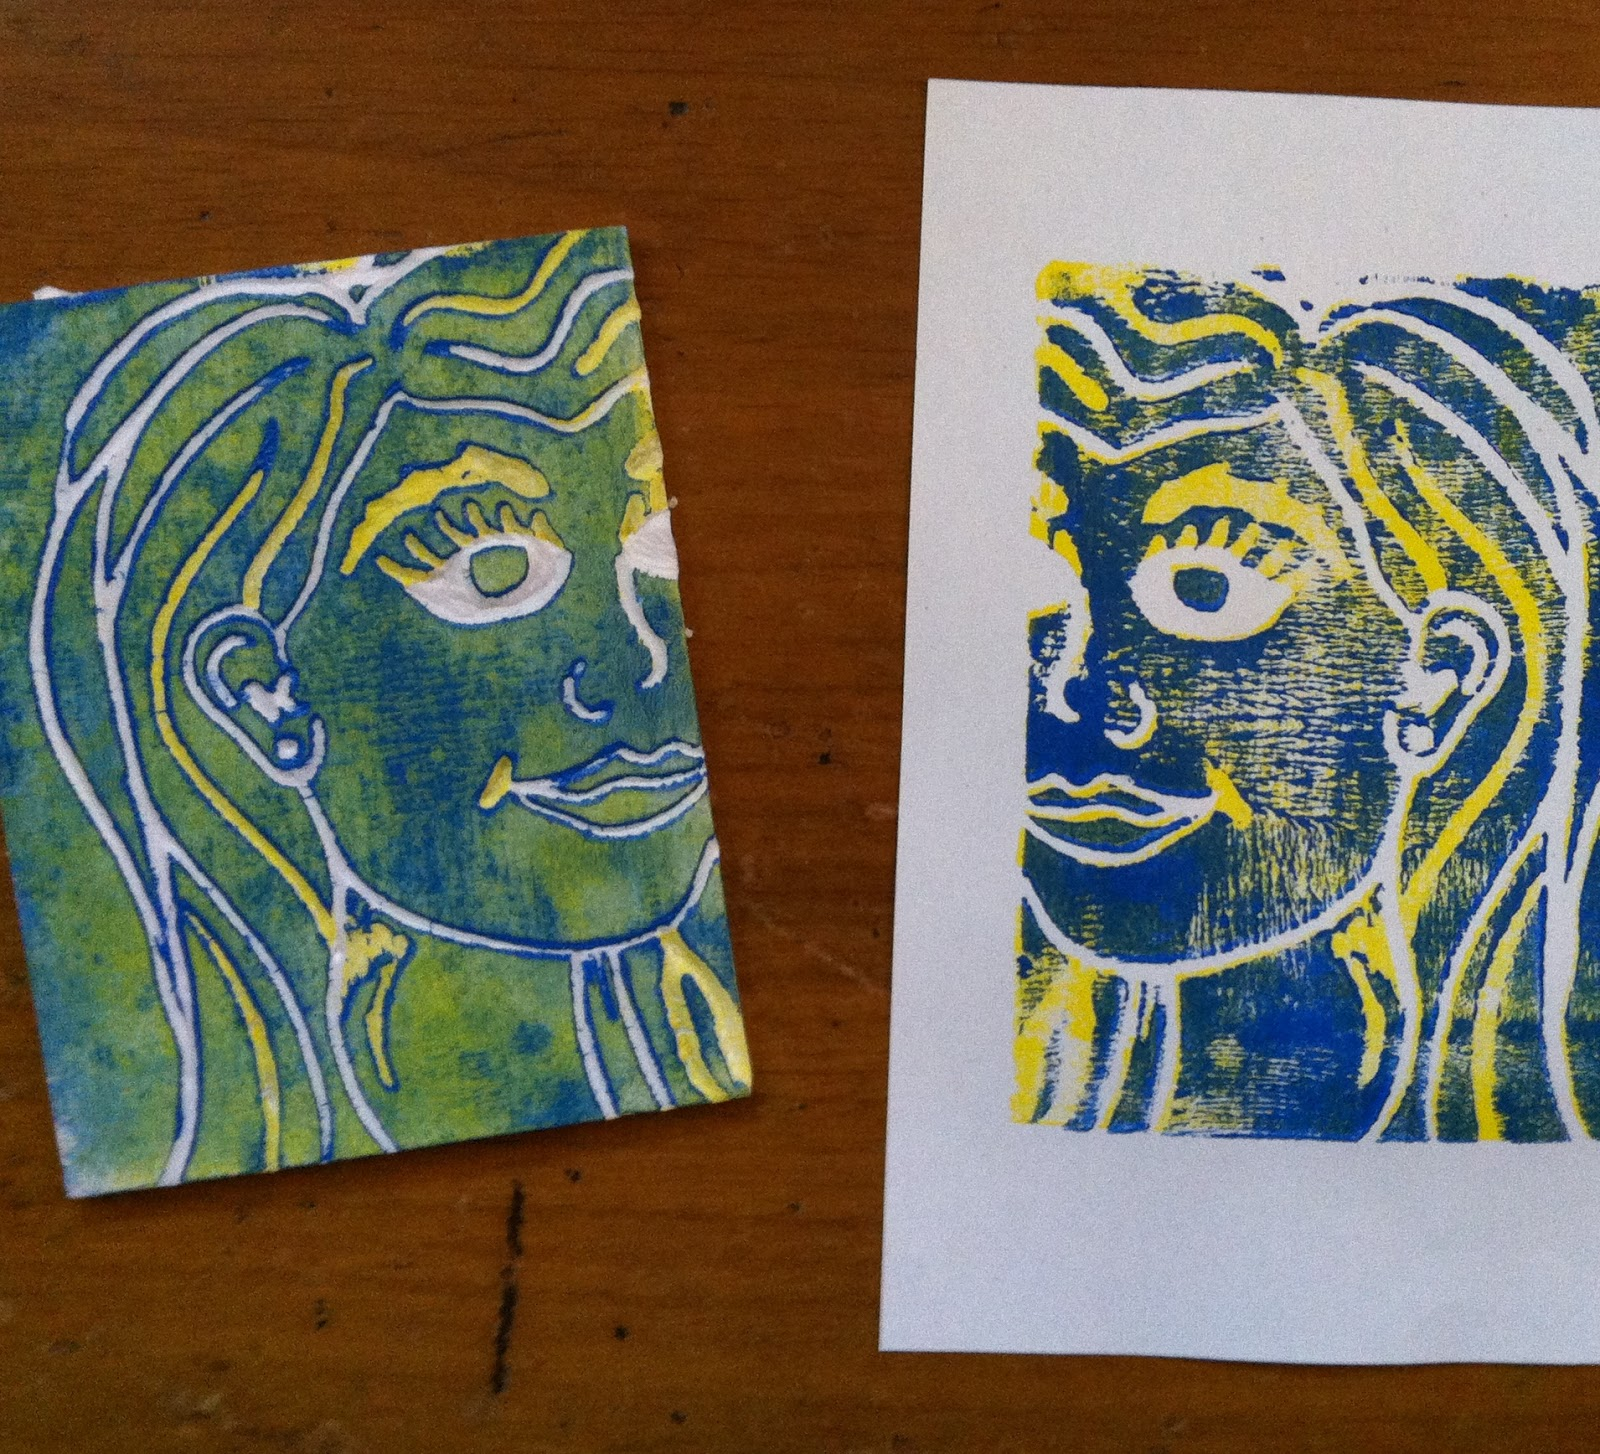 This week in Open Studio Sessions - Styrofoam Printmaking ...